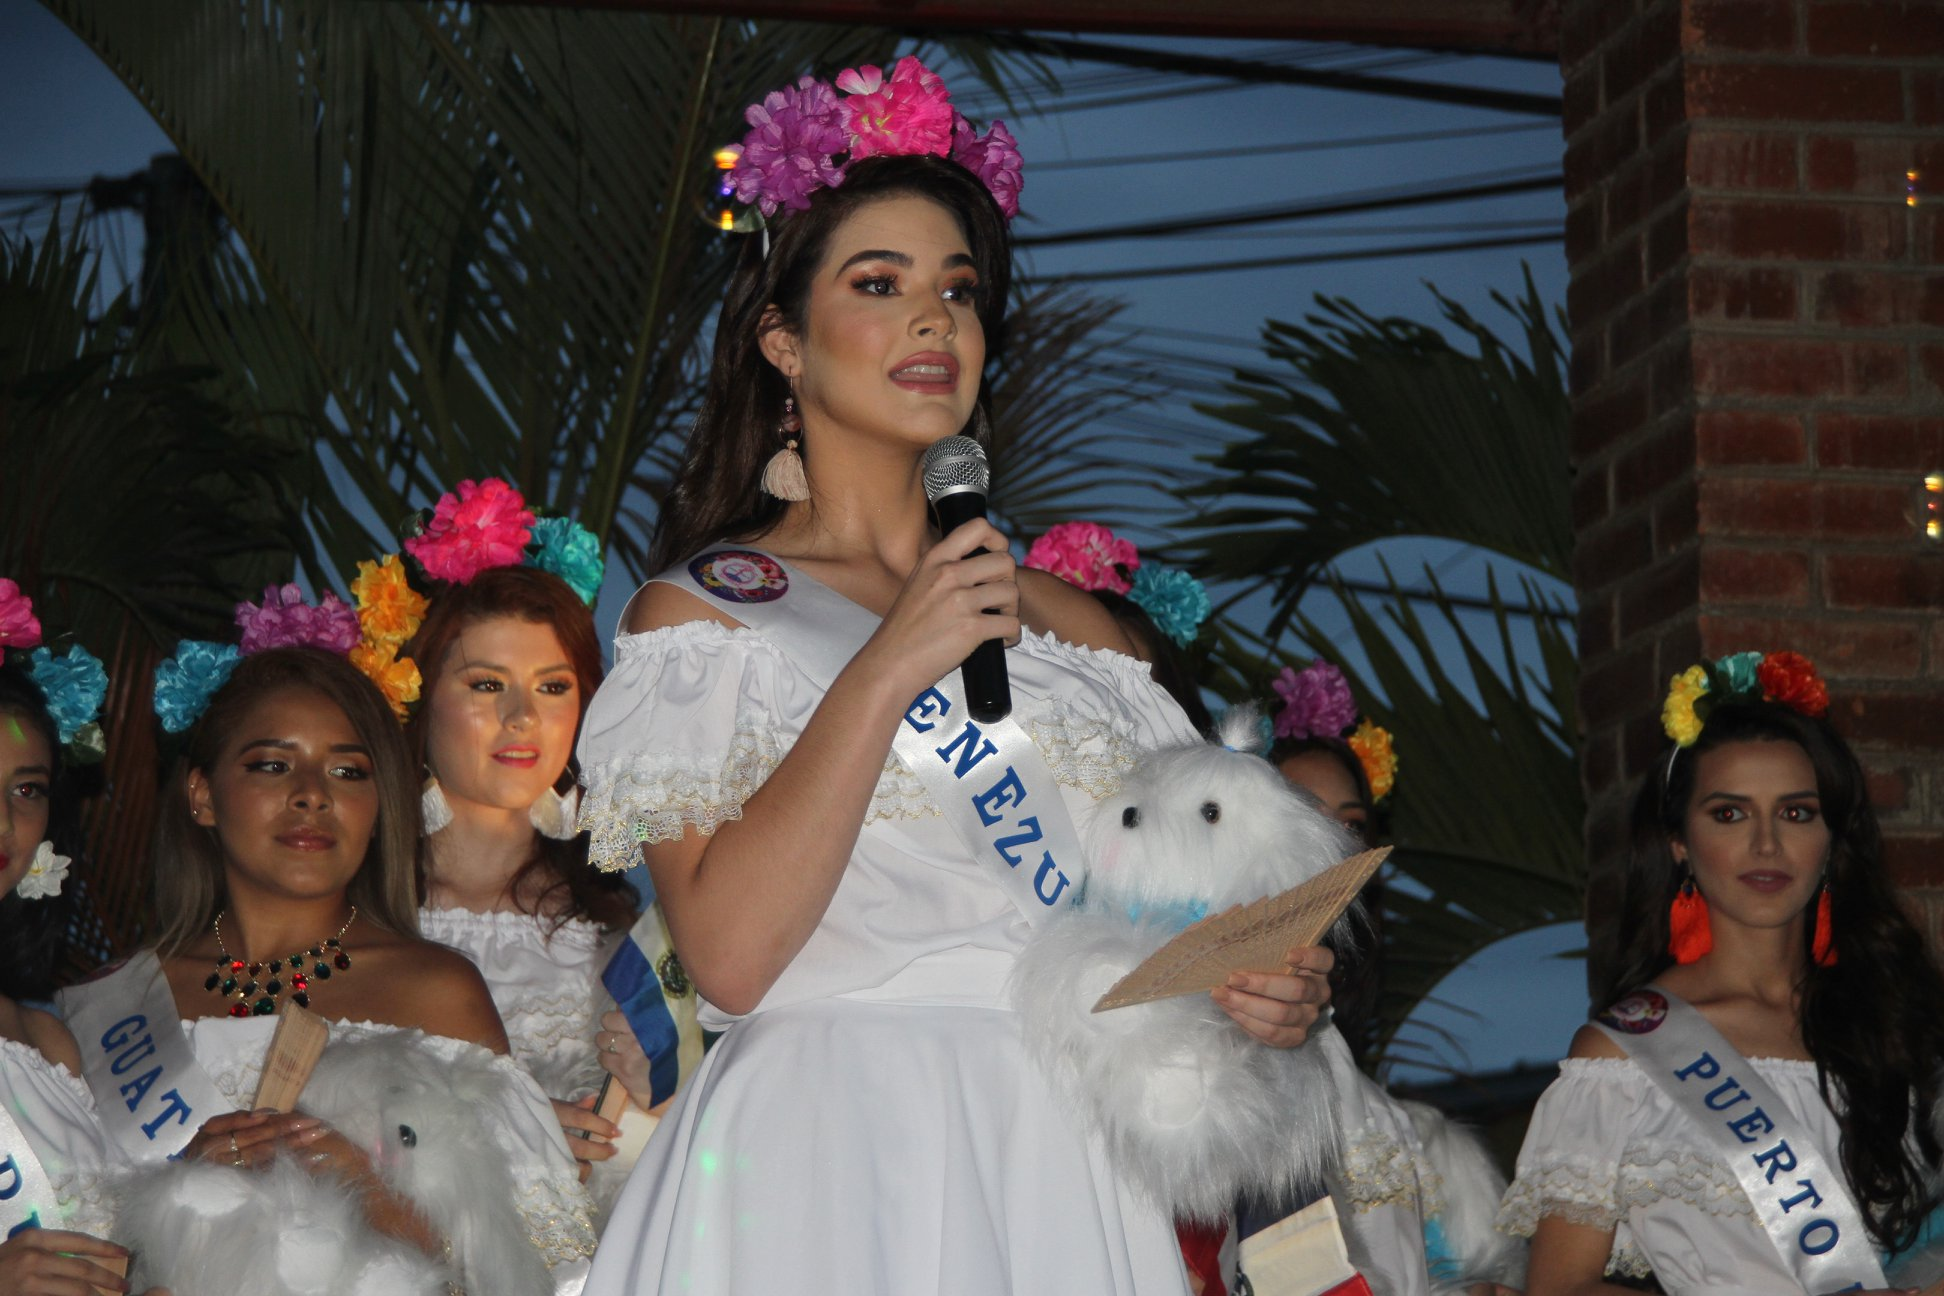 daniela di venere, top 12 de miss teen mundial 2019. - Página 4 60967010